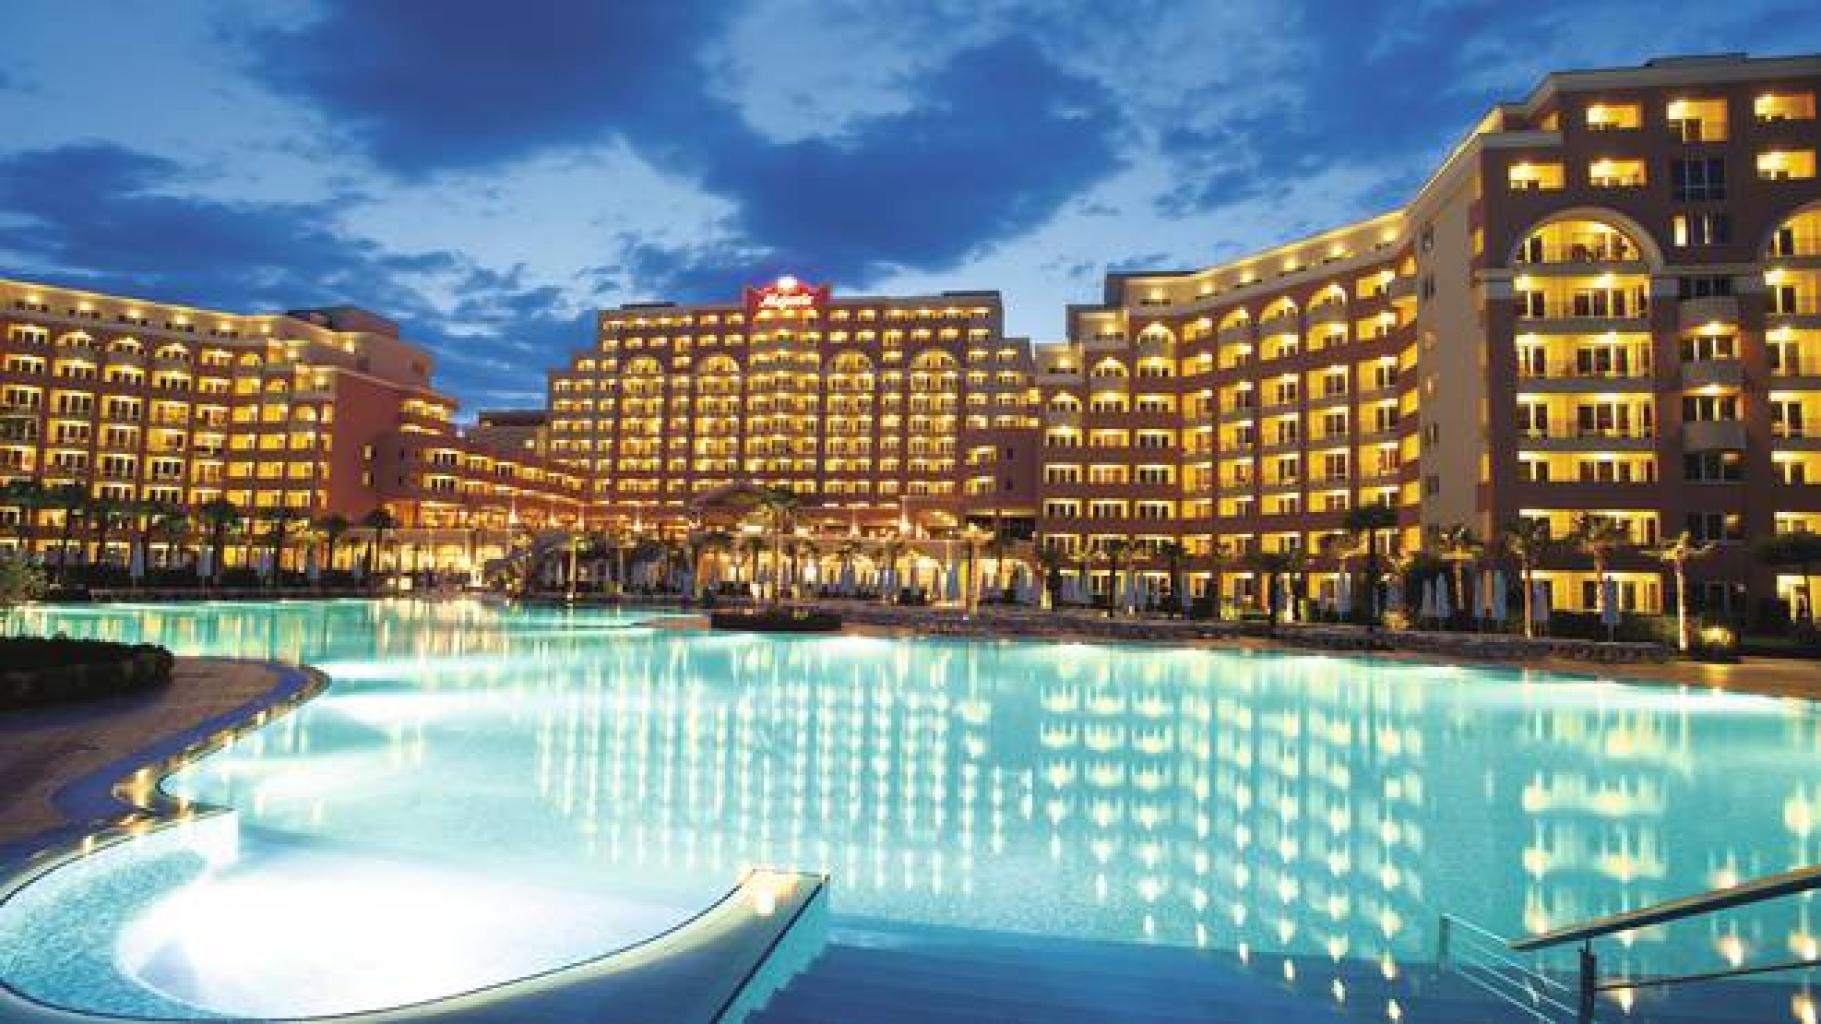 Hotels Near Tn Aj